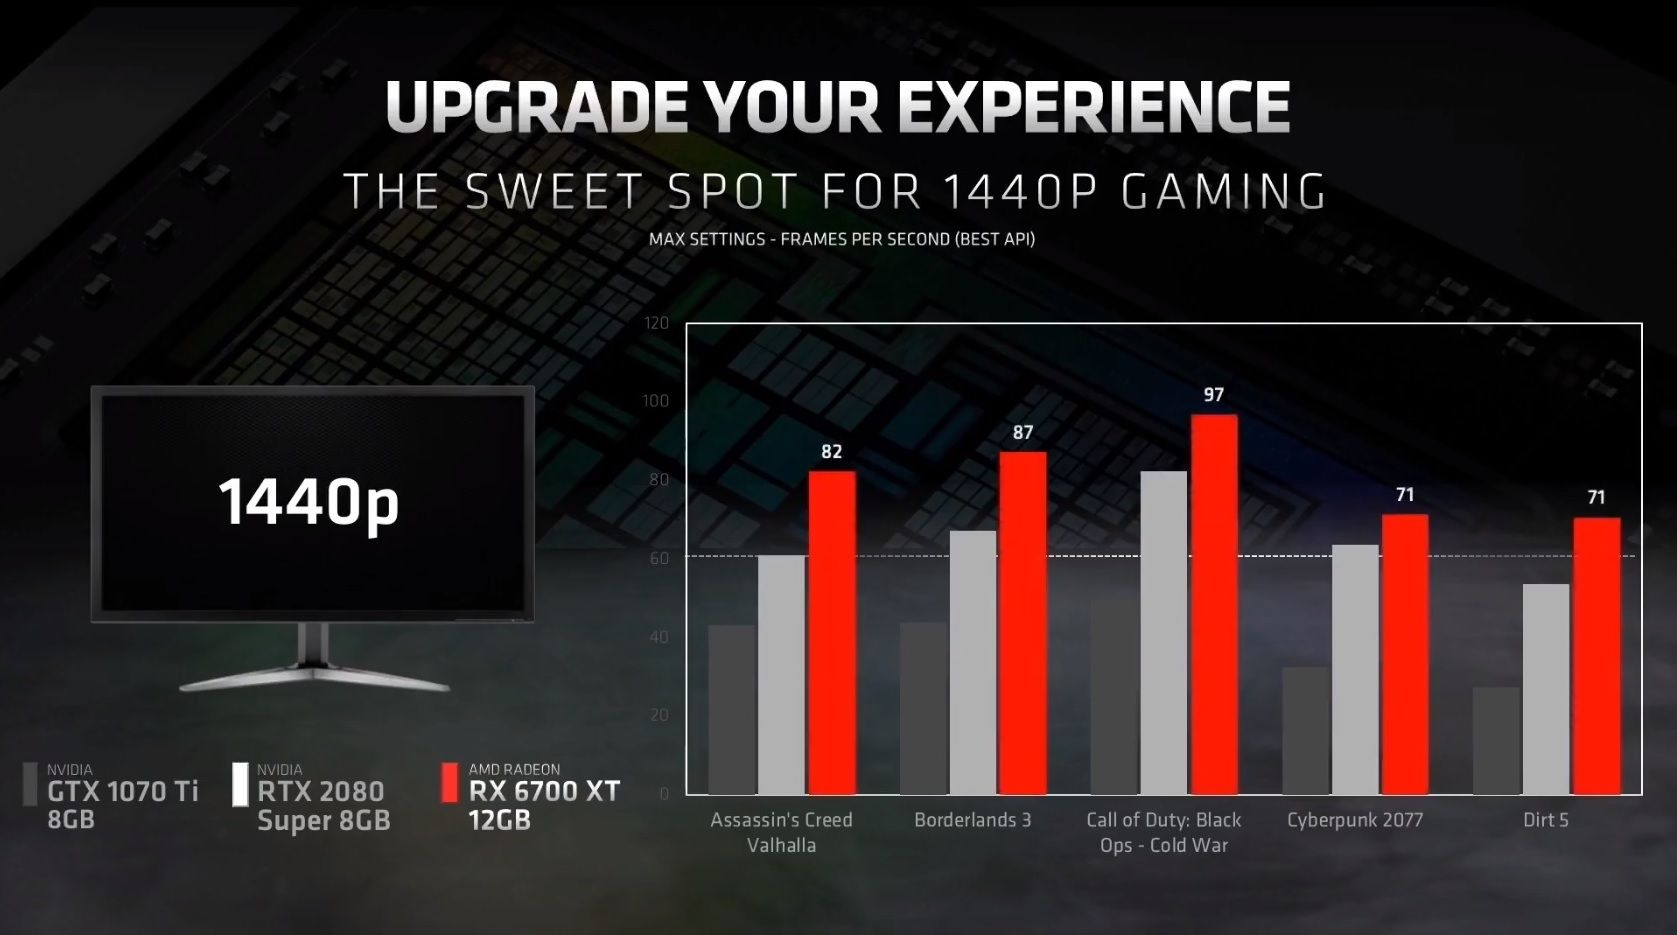 AMD Radeon RX 6700 XT perfs